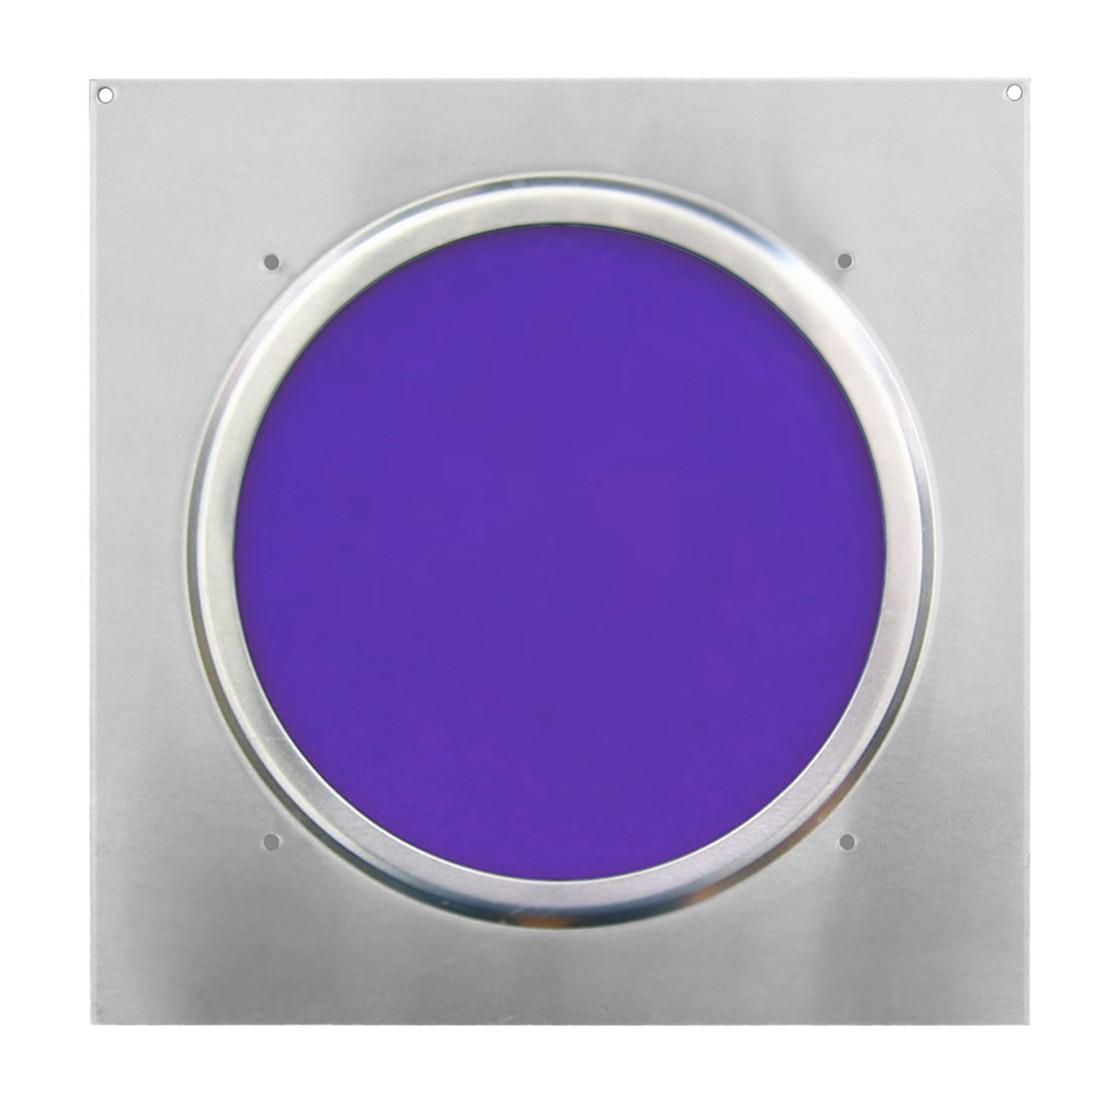 American DJ Dichrofilter PAR 56 (srebrny) fioletowy - filtr do reflektorów PAR 56